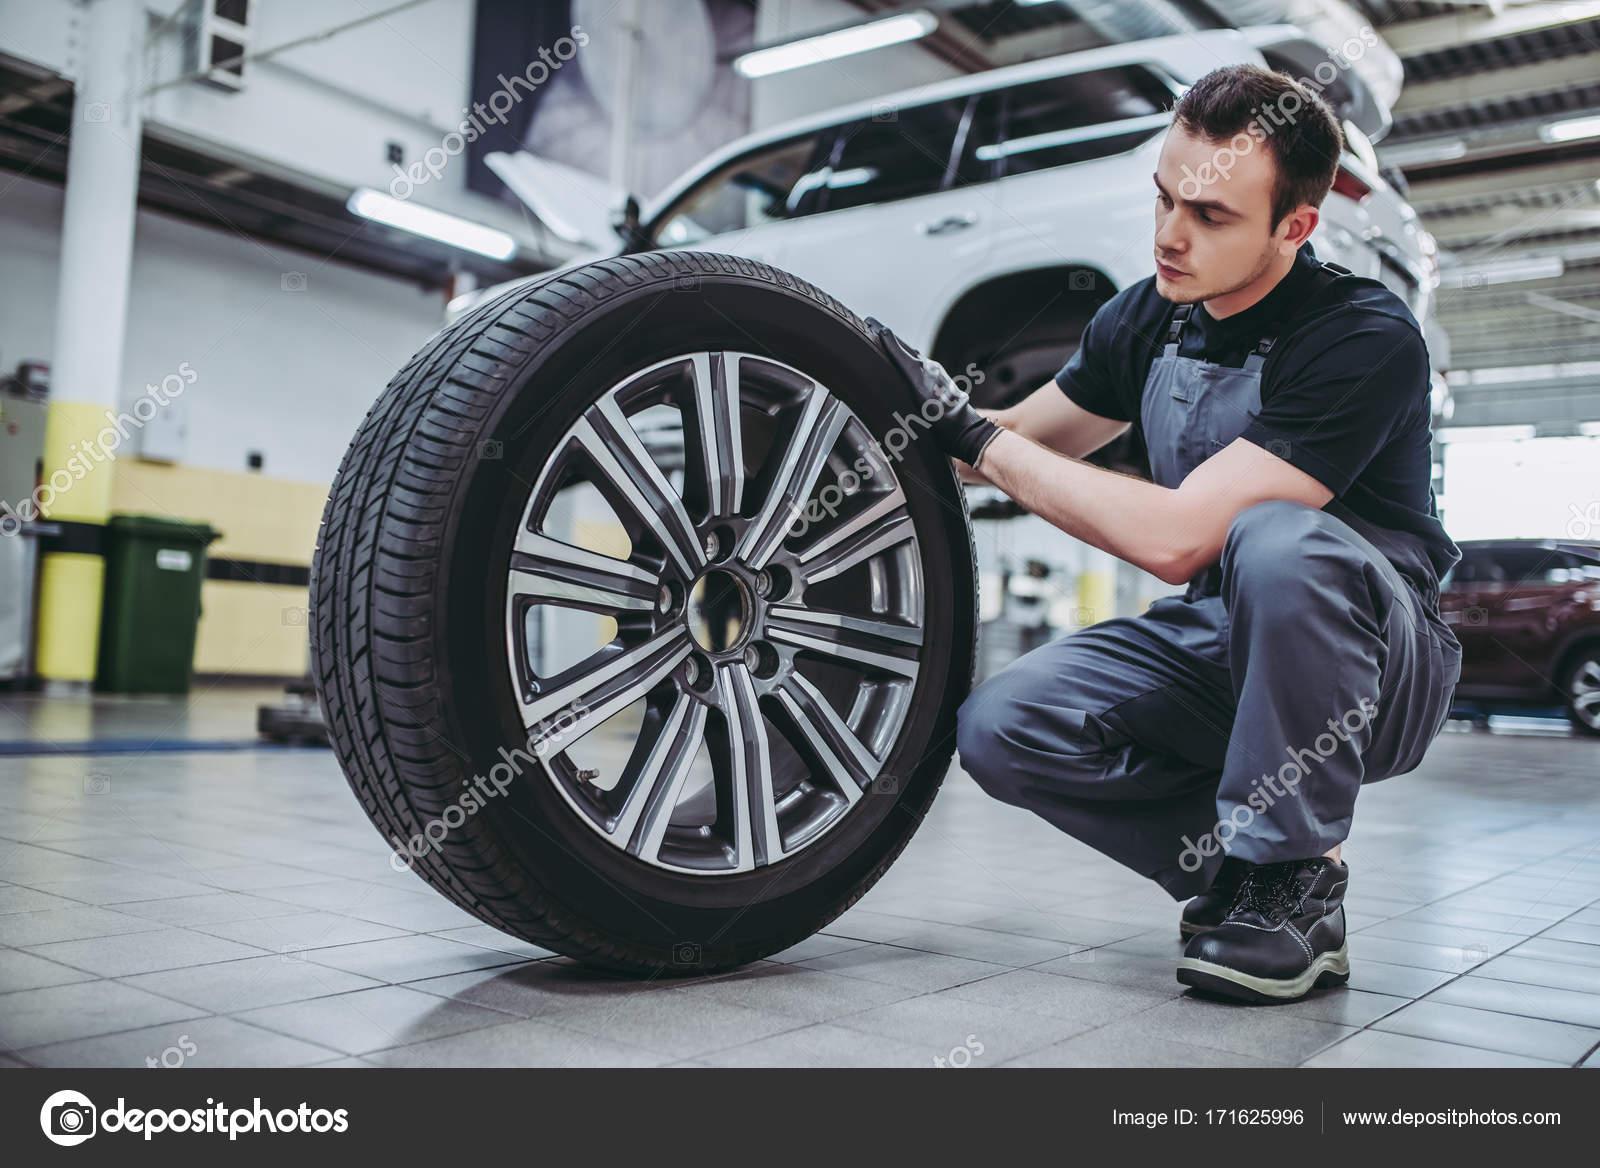 Gut aussehend Kfz-Service-Mechaniker — Stockfoto © 4pmphoto@gmail ...